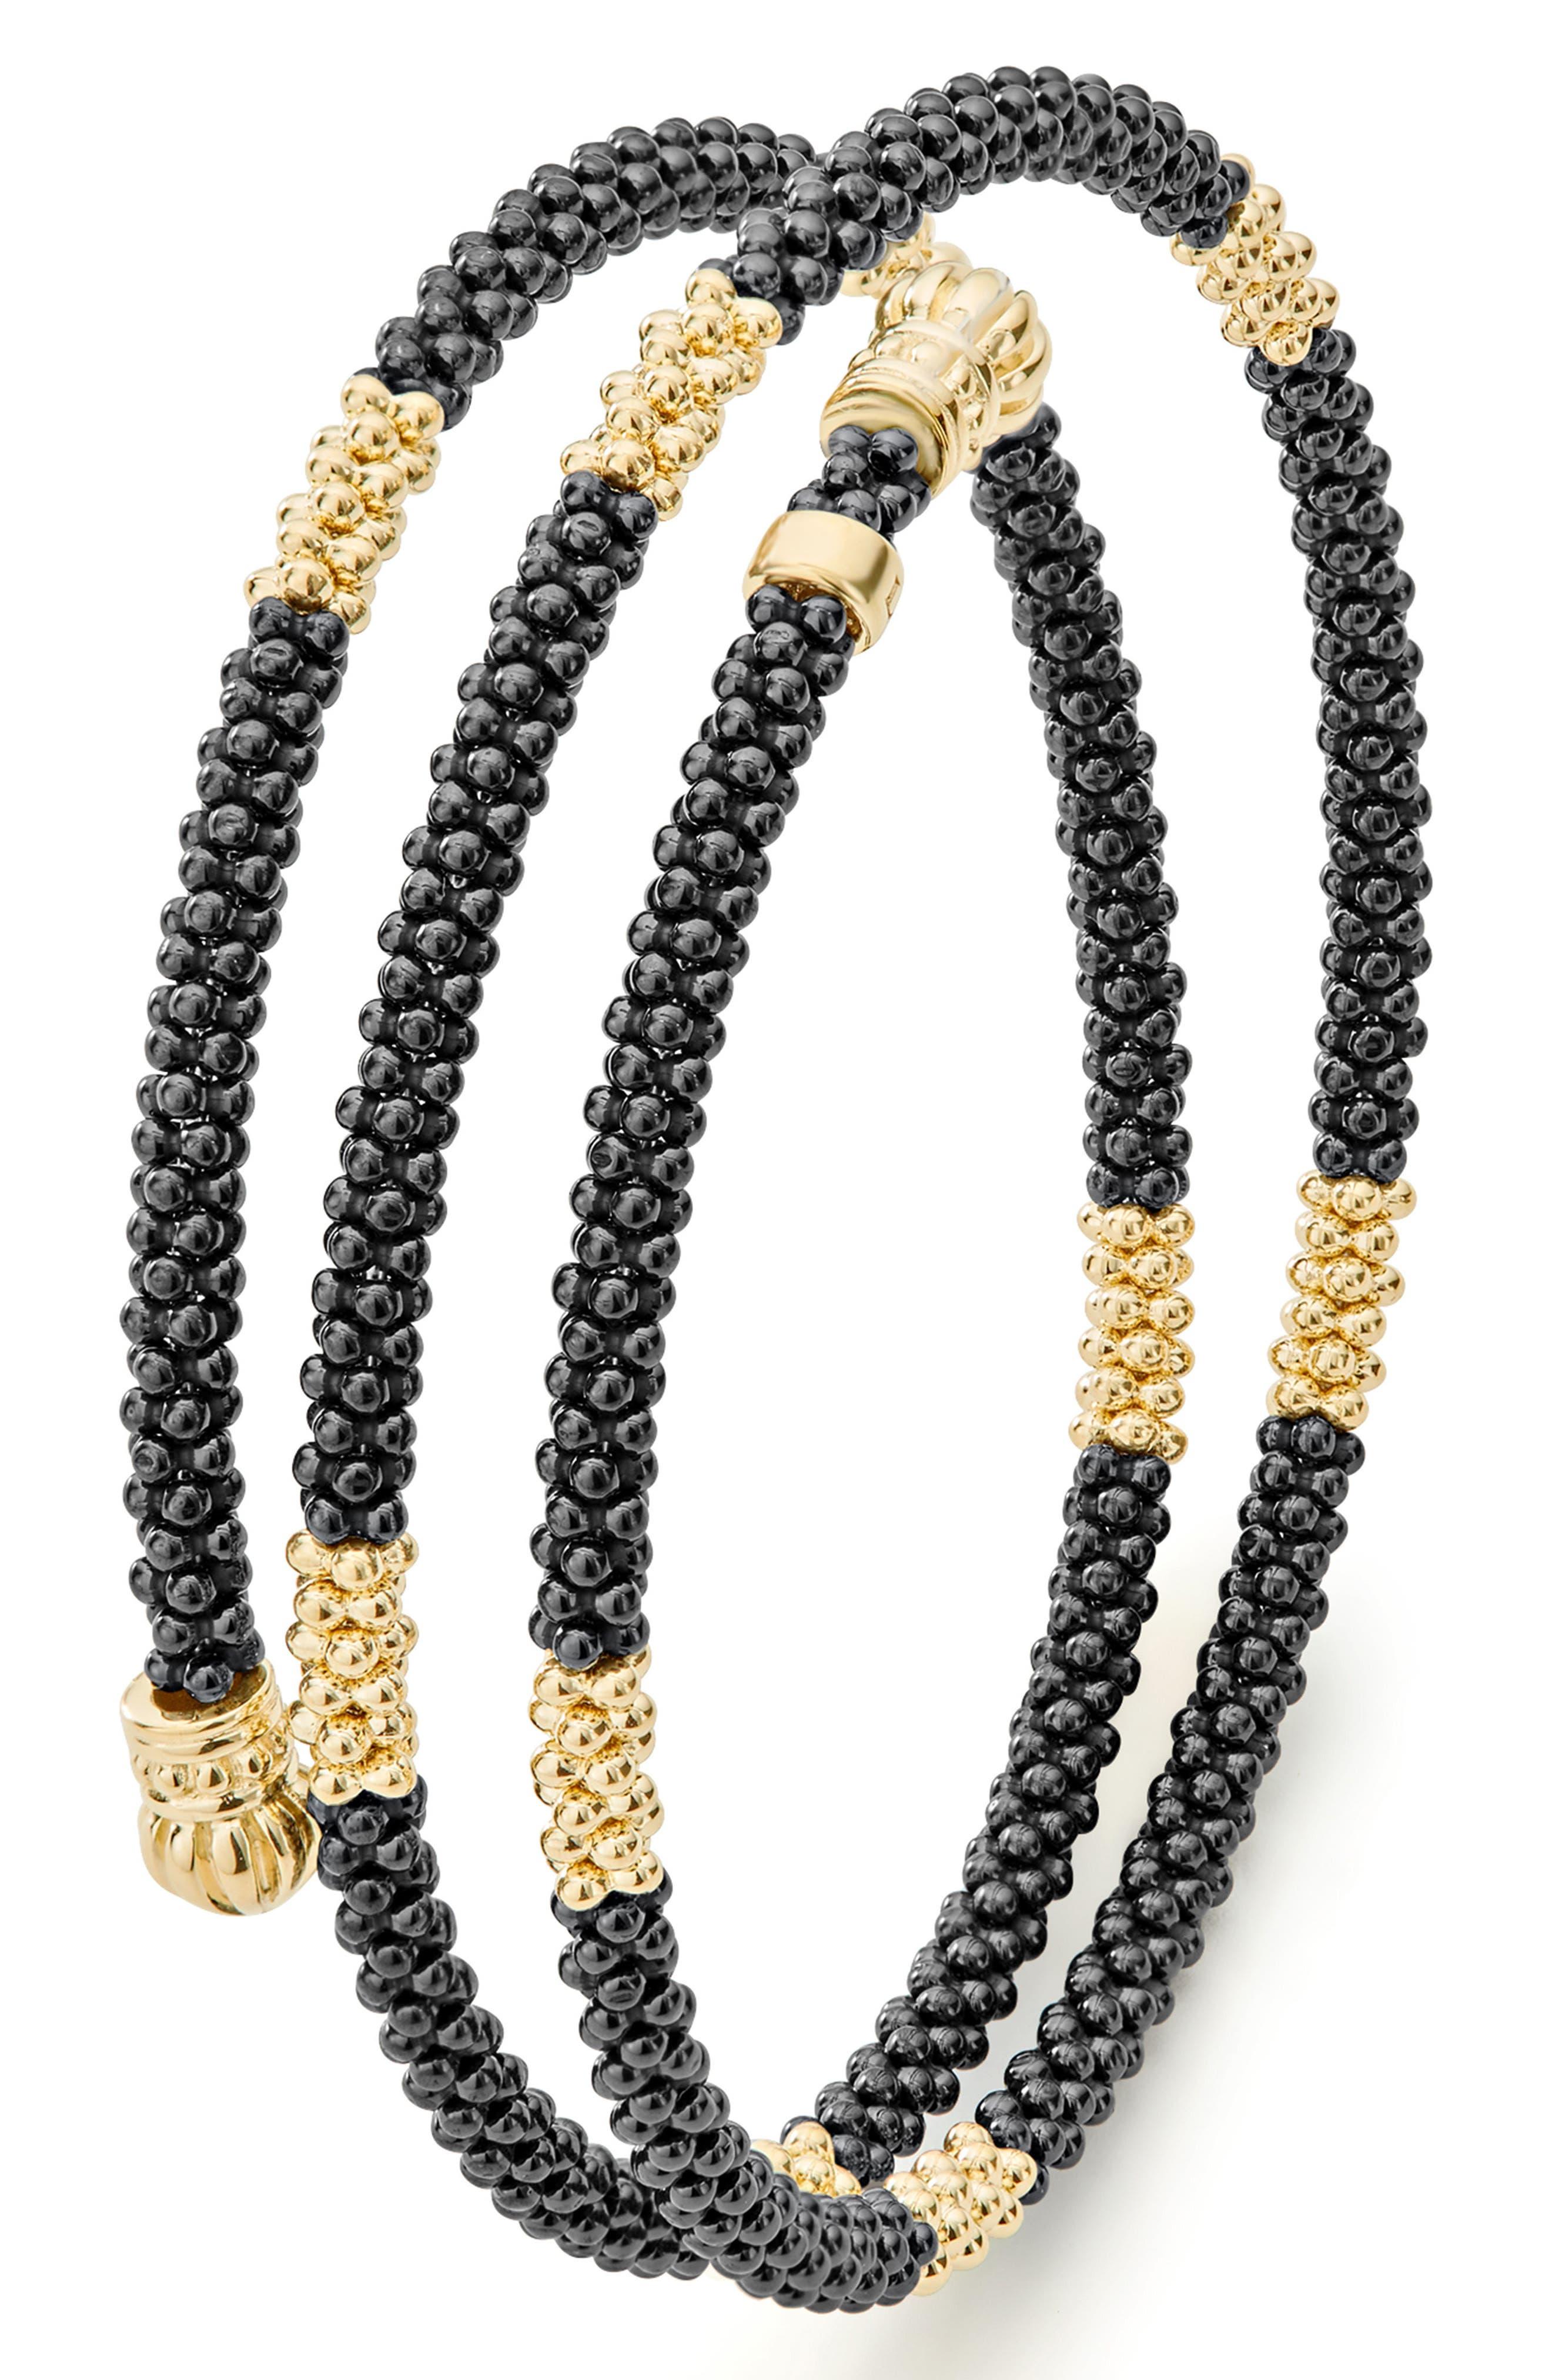 Gold & Black Caviar Coil Bracelet,                             Alternate thumbnail 6, color,                             GOLD